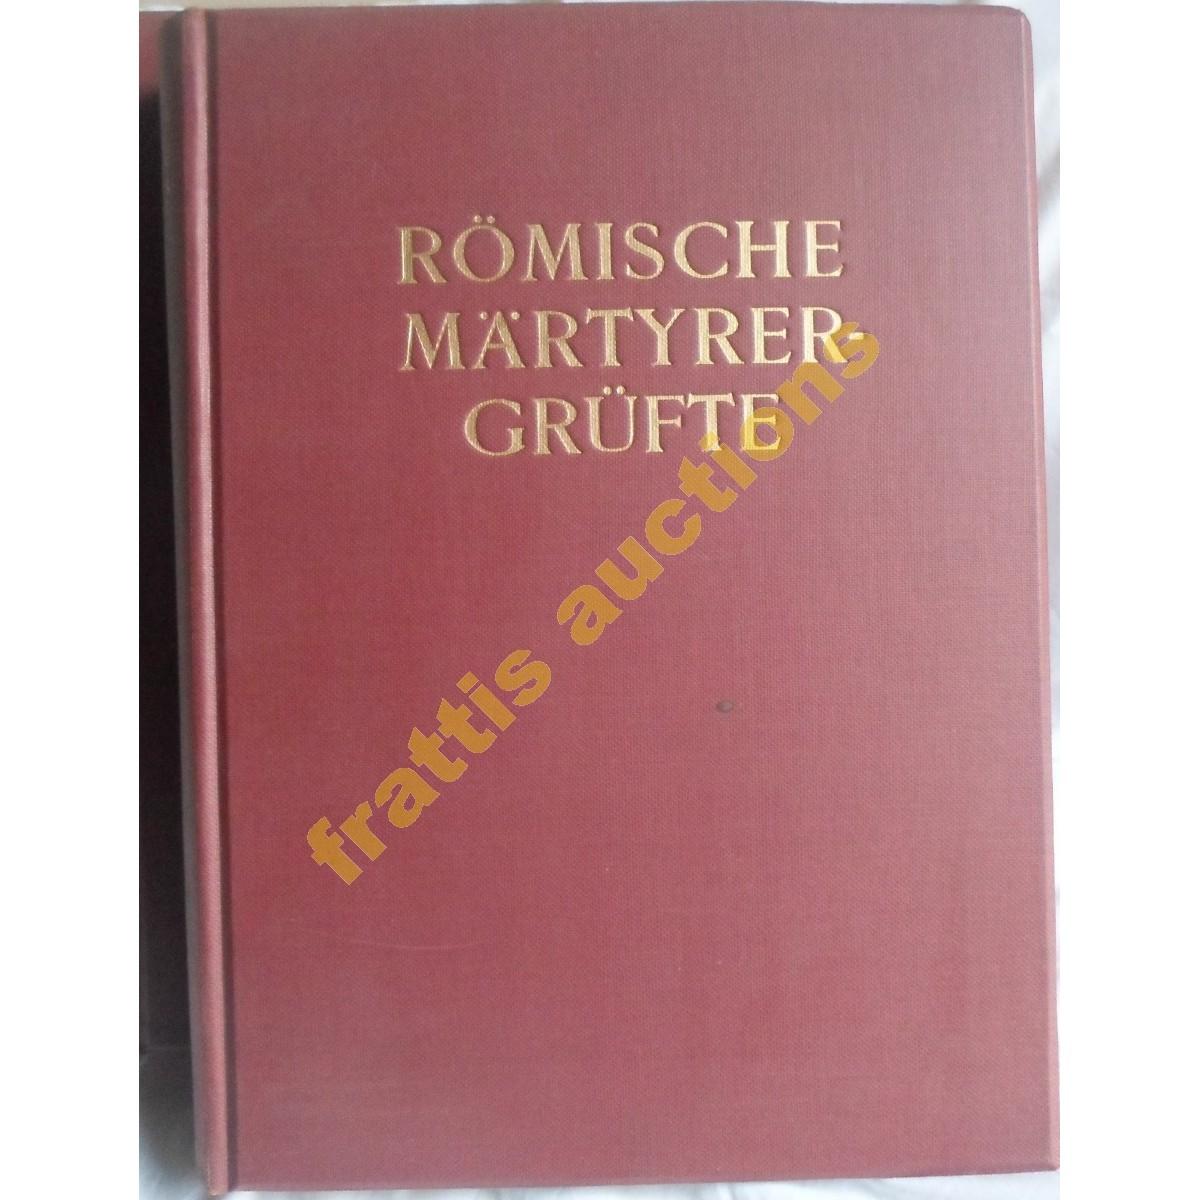 Paul Styger, 2 τόμοι ROMISCHE MARTYRERGRUFTE. 1935 Βερολίνο